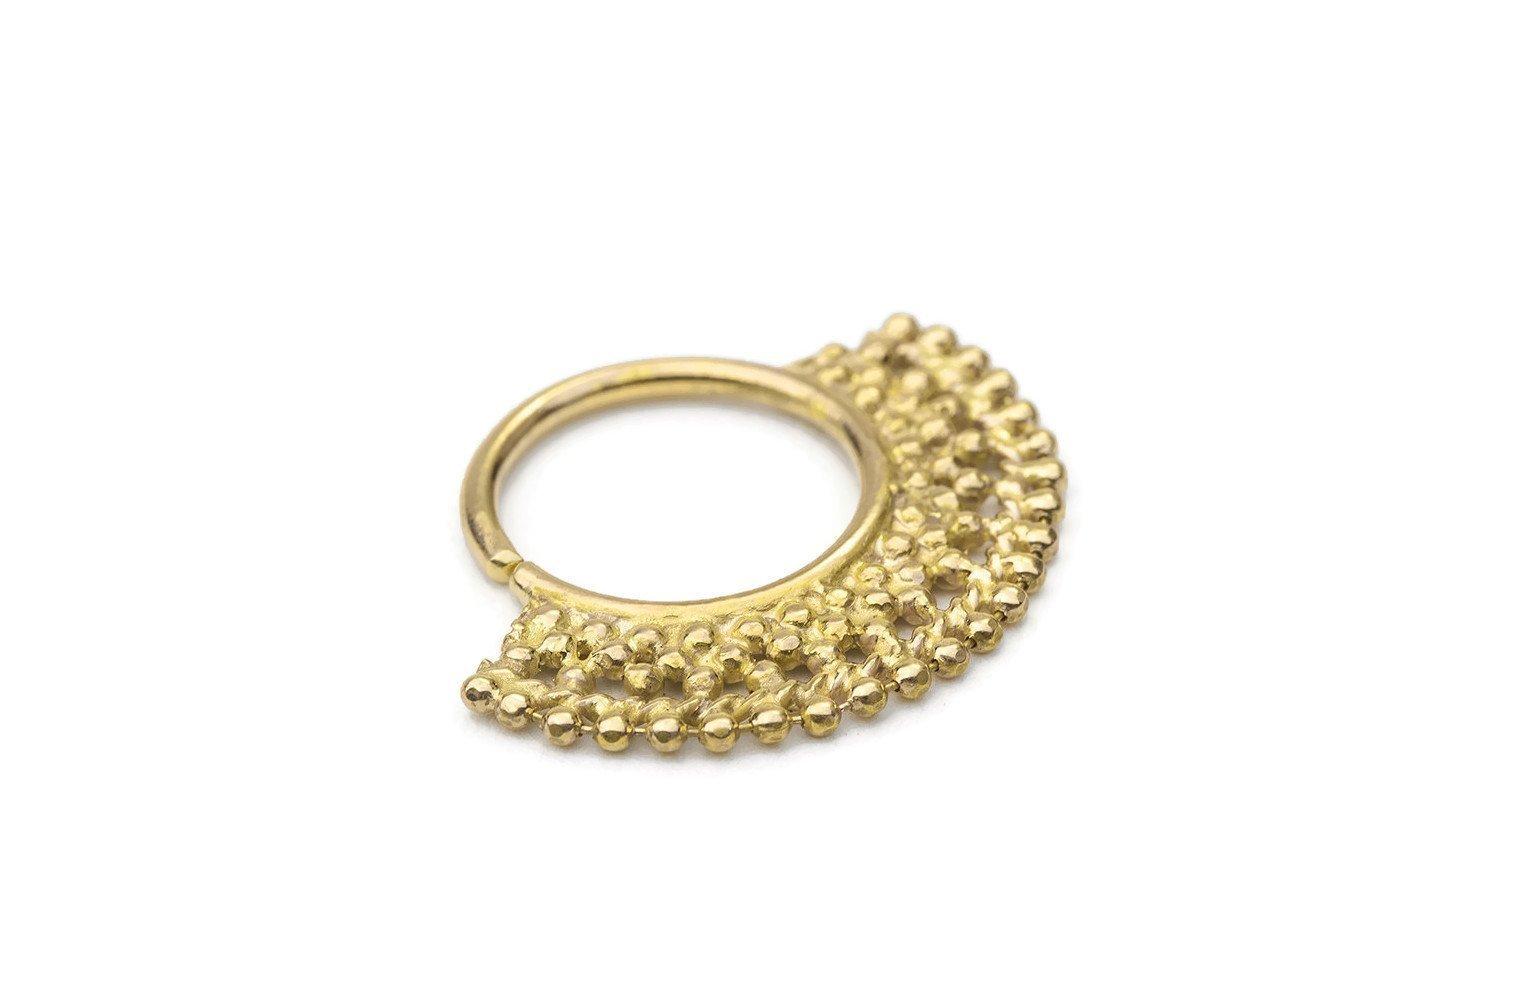 Tribal Septum Ring: Solid 14k Gold 20g-14g Septum / Ear Piercings Jewelry.